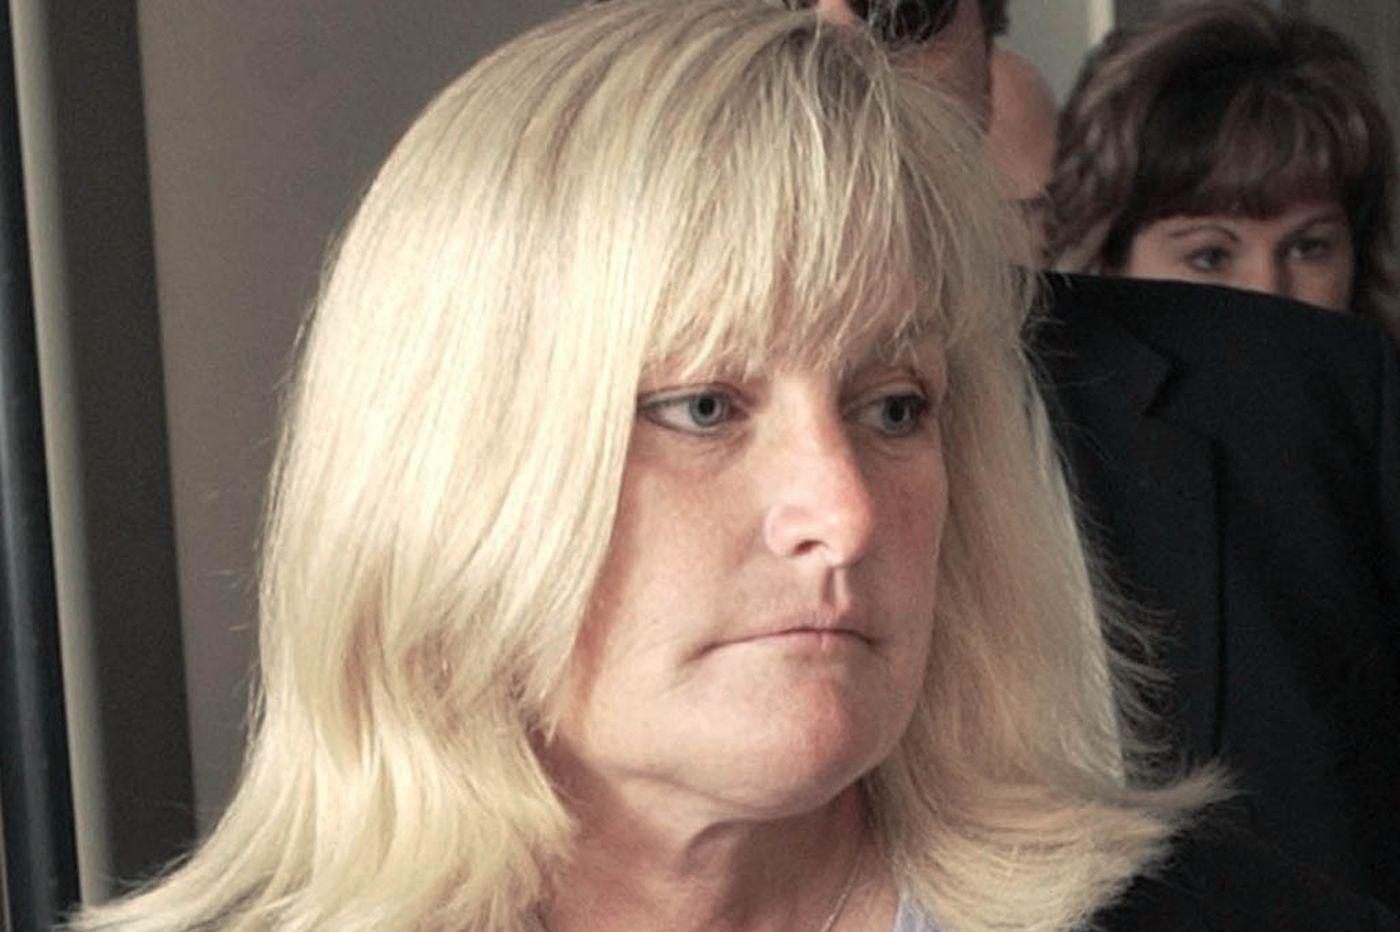 Molestation allegation starts Rowe row